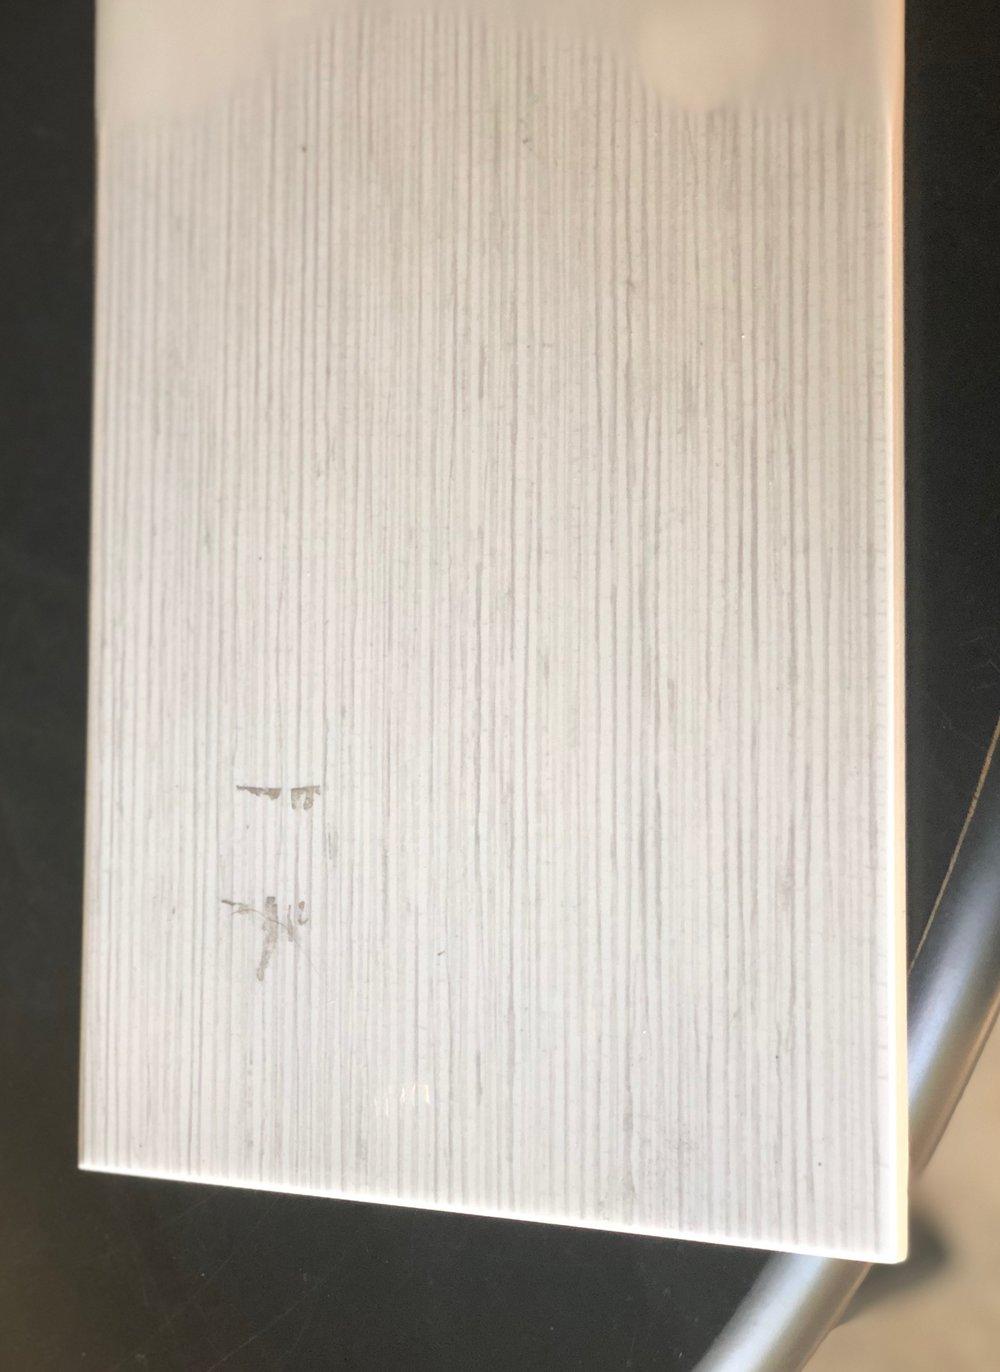 8x12 Brunei Blanco Glossy.JPG